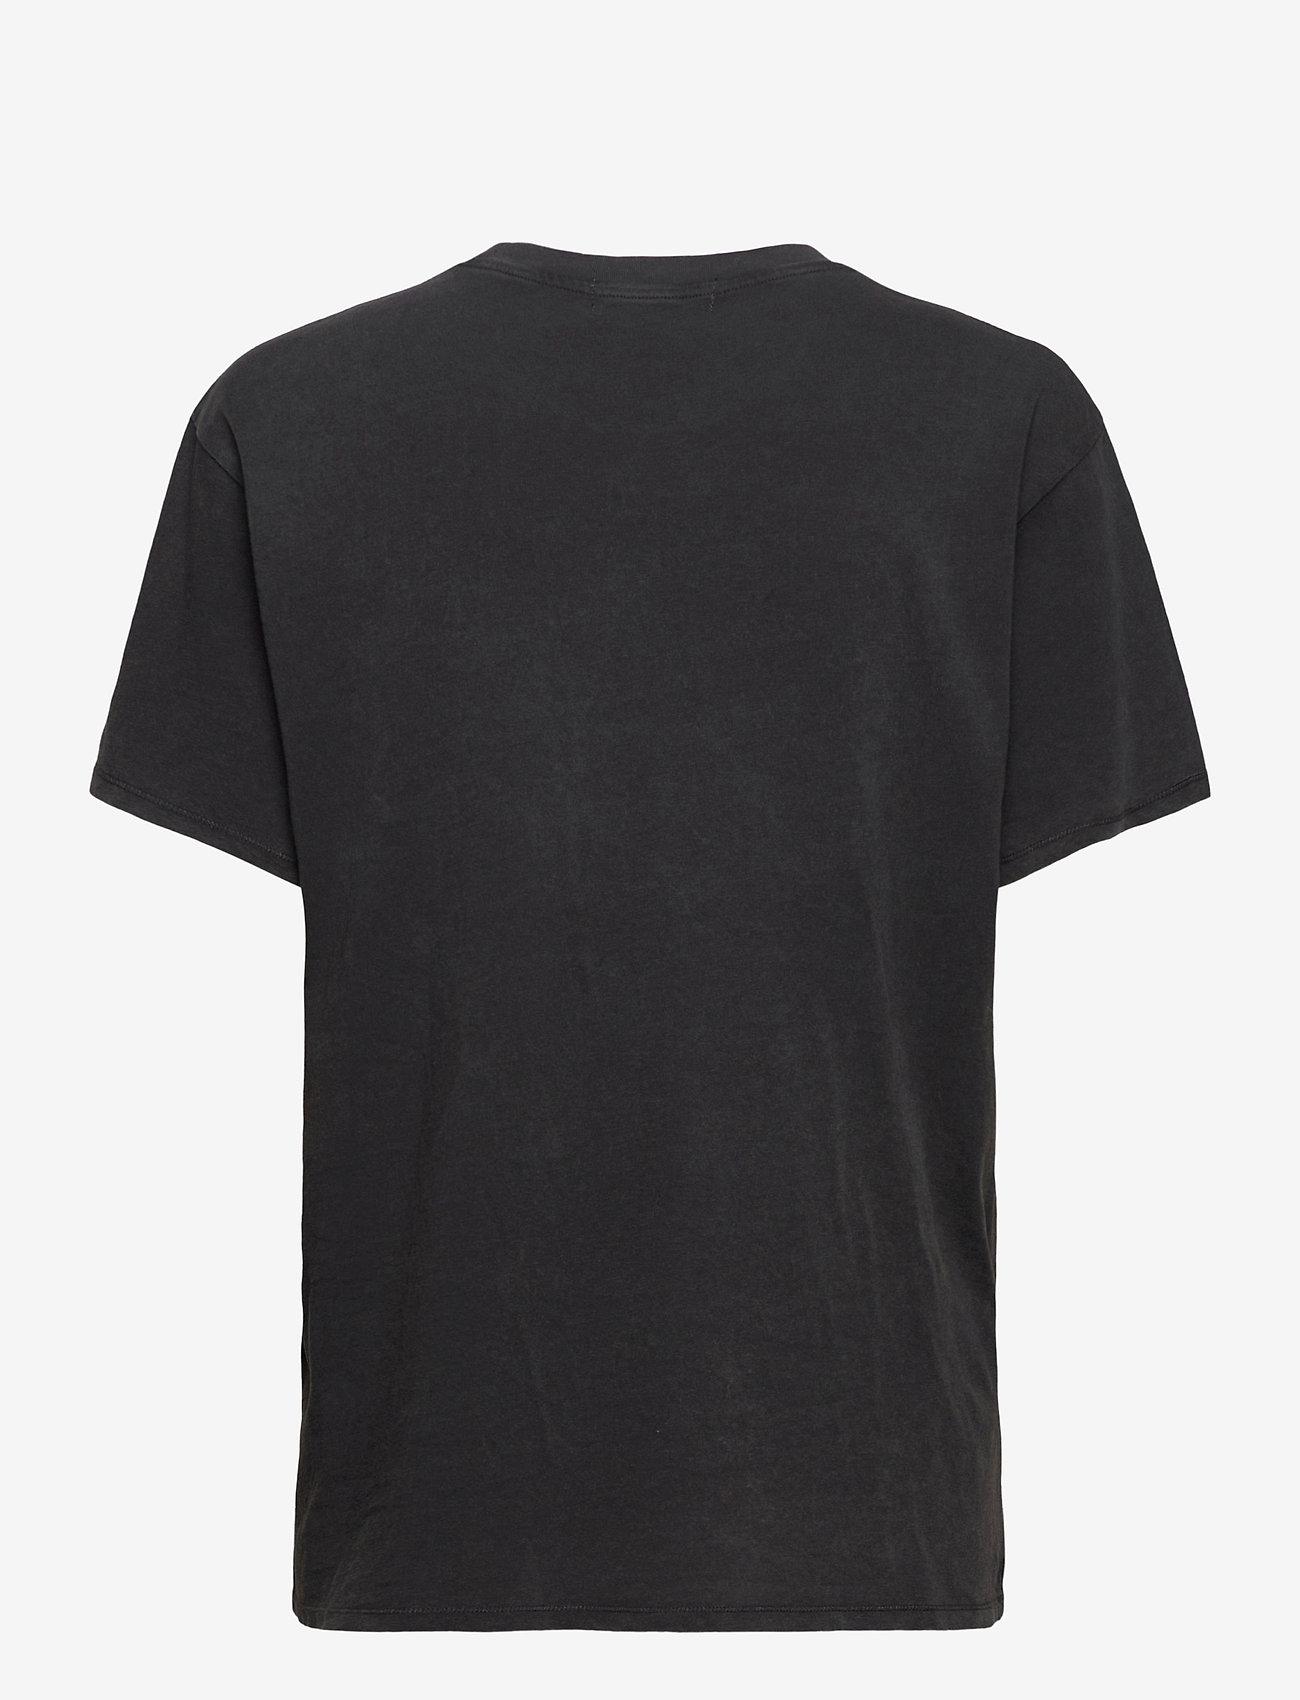 Desigual - TS VINTAGE MICKEY - t-shirts - gris medio - 1